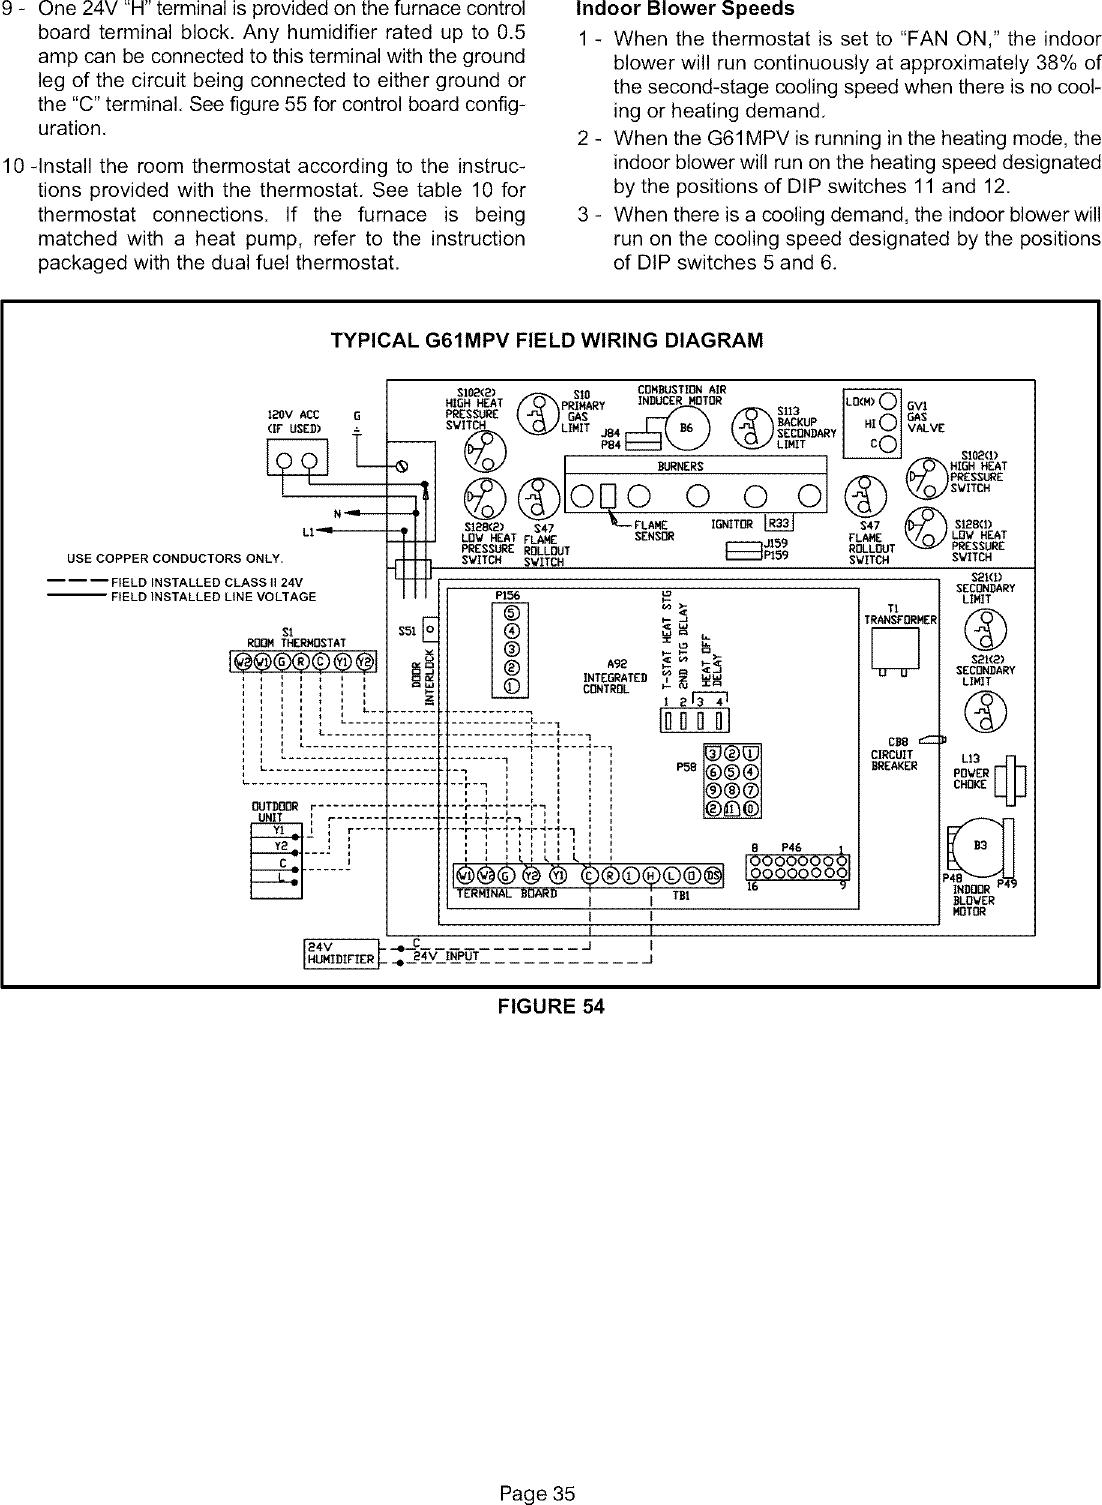 LENNOX Furnace/Heater, Gas Manual L0806230